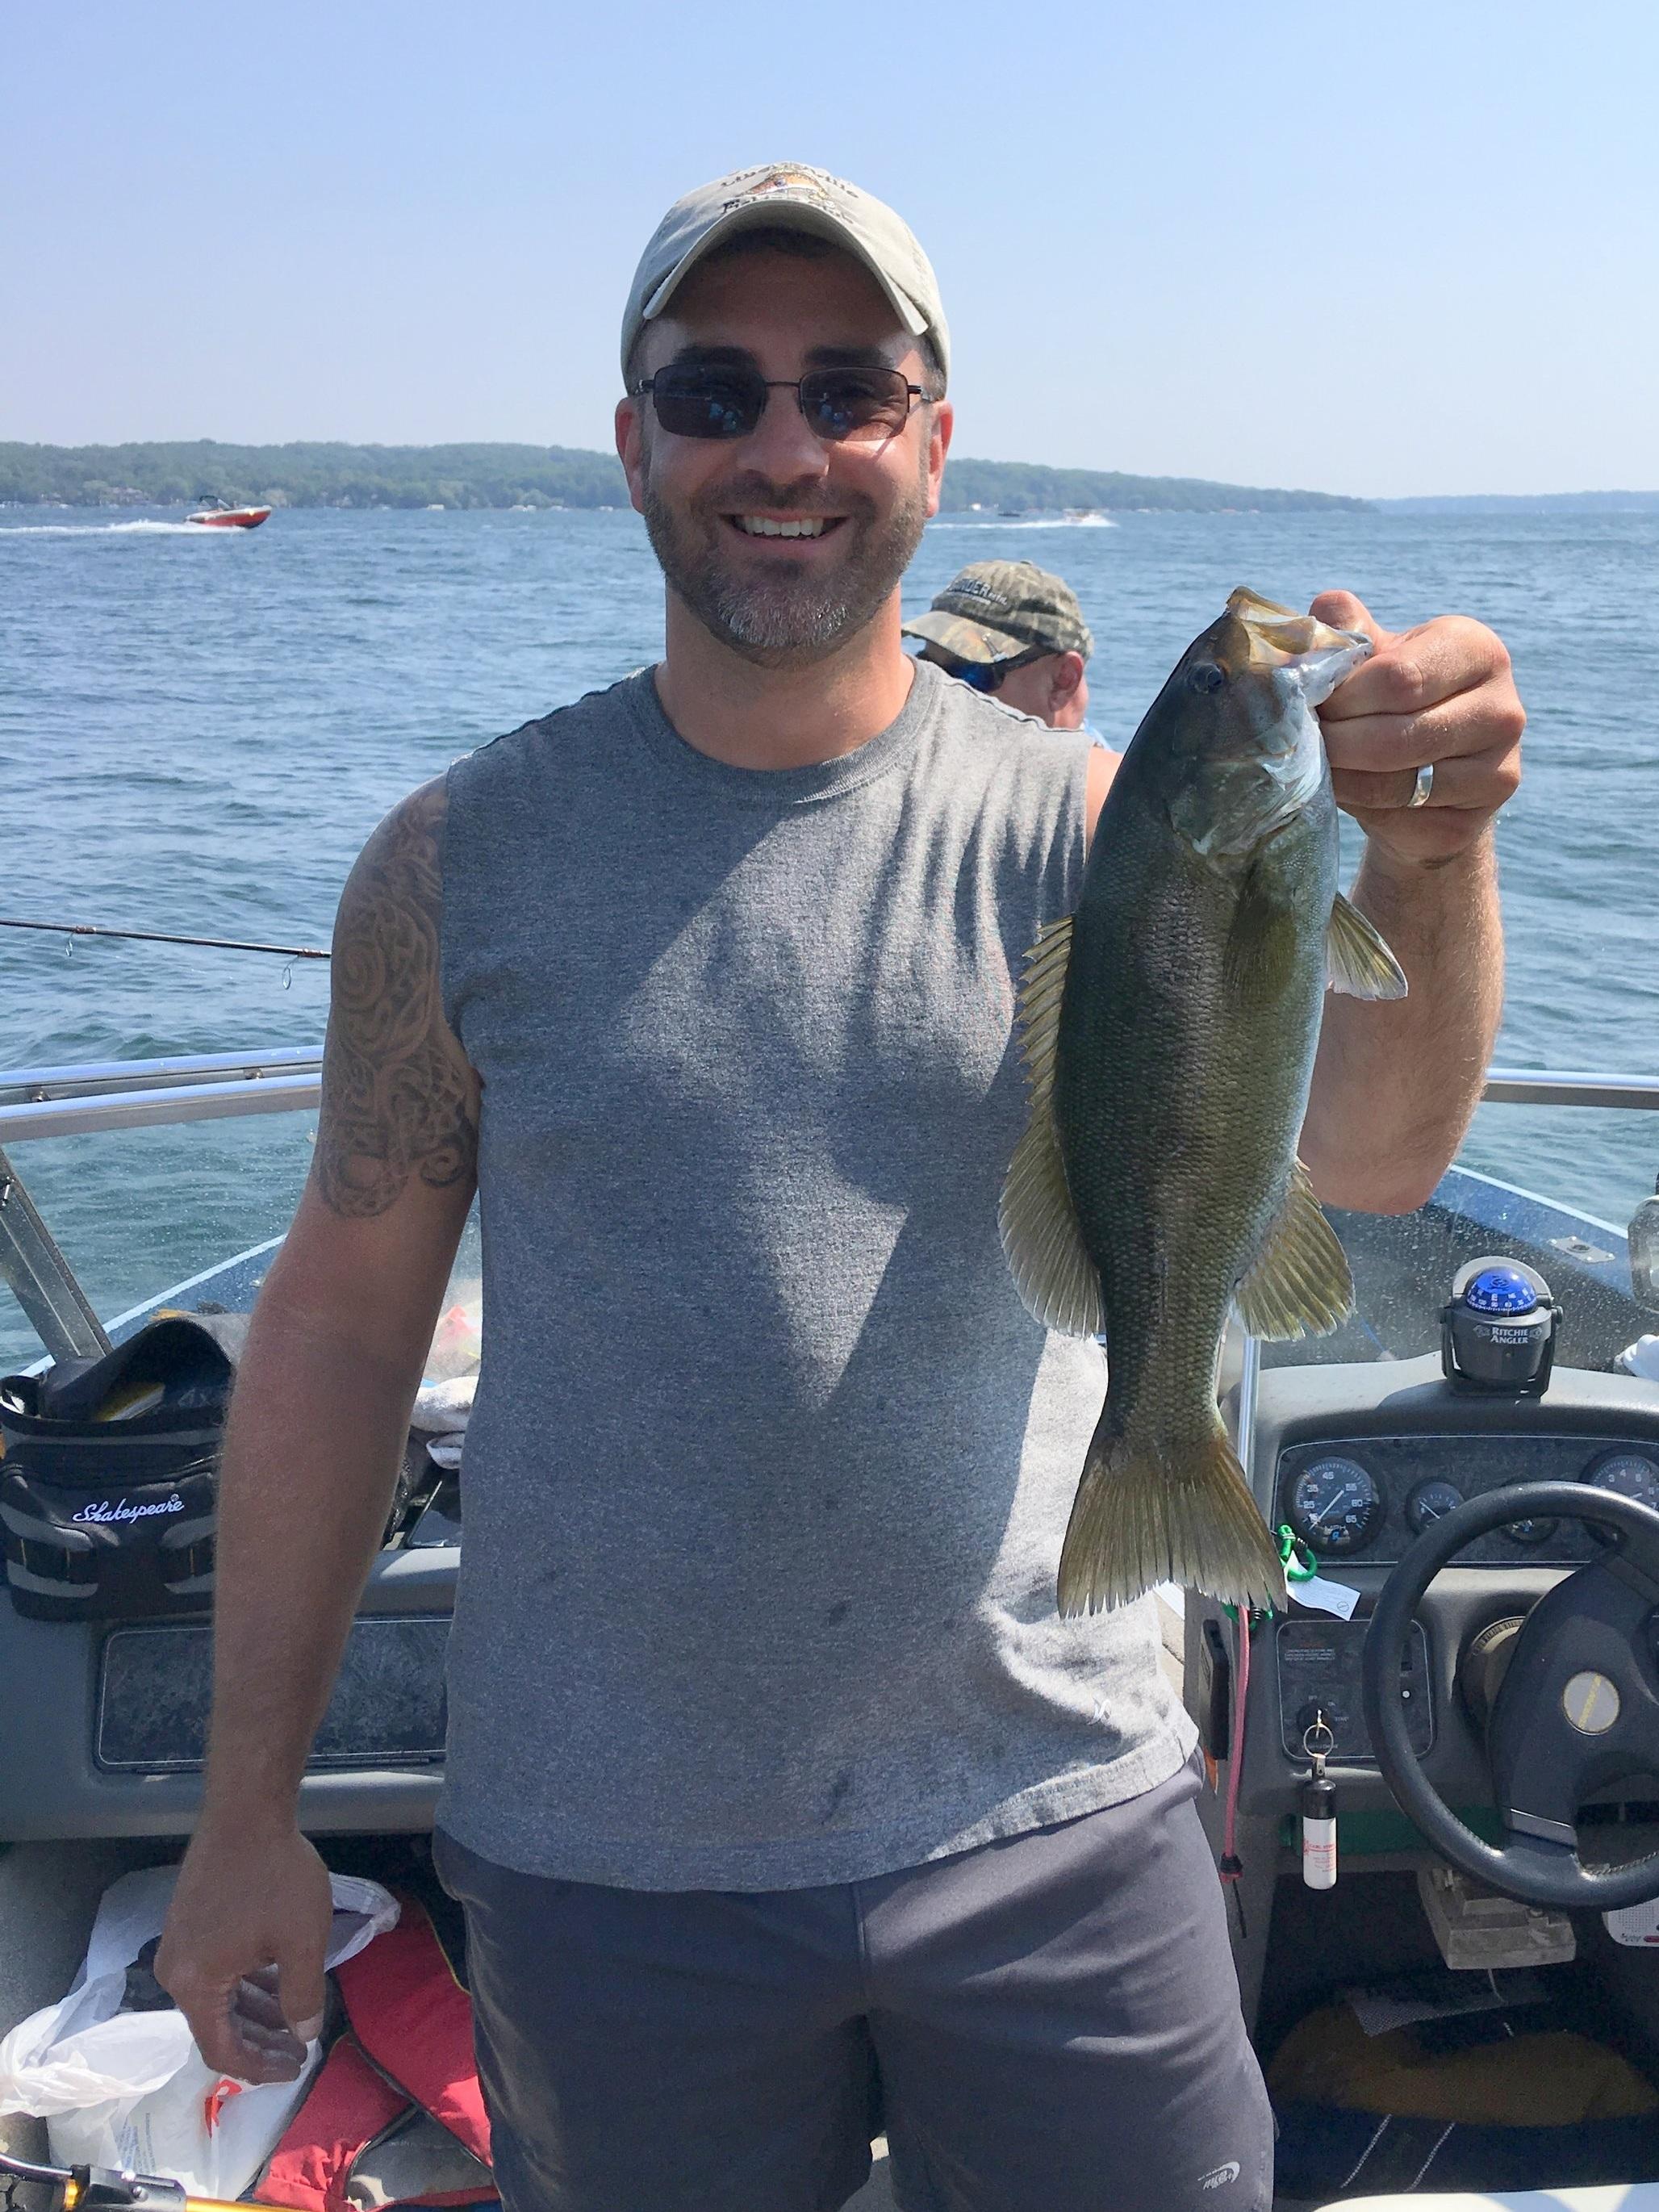 Member Jason Cashmore with a Lake Geneva smallmouth bass.